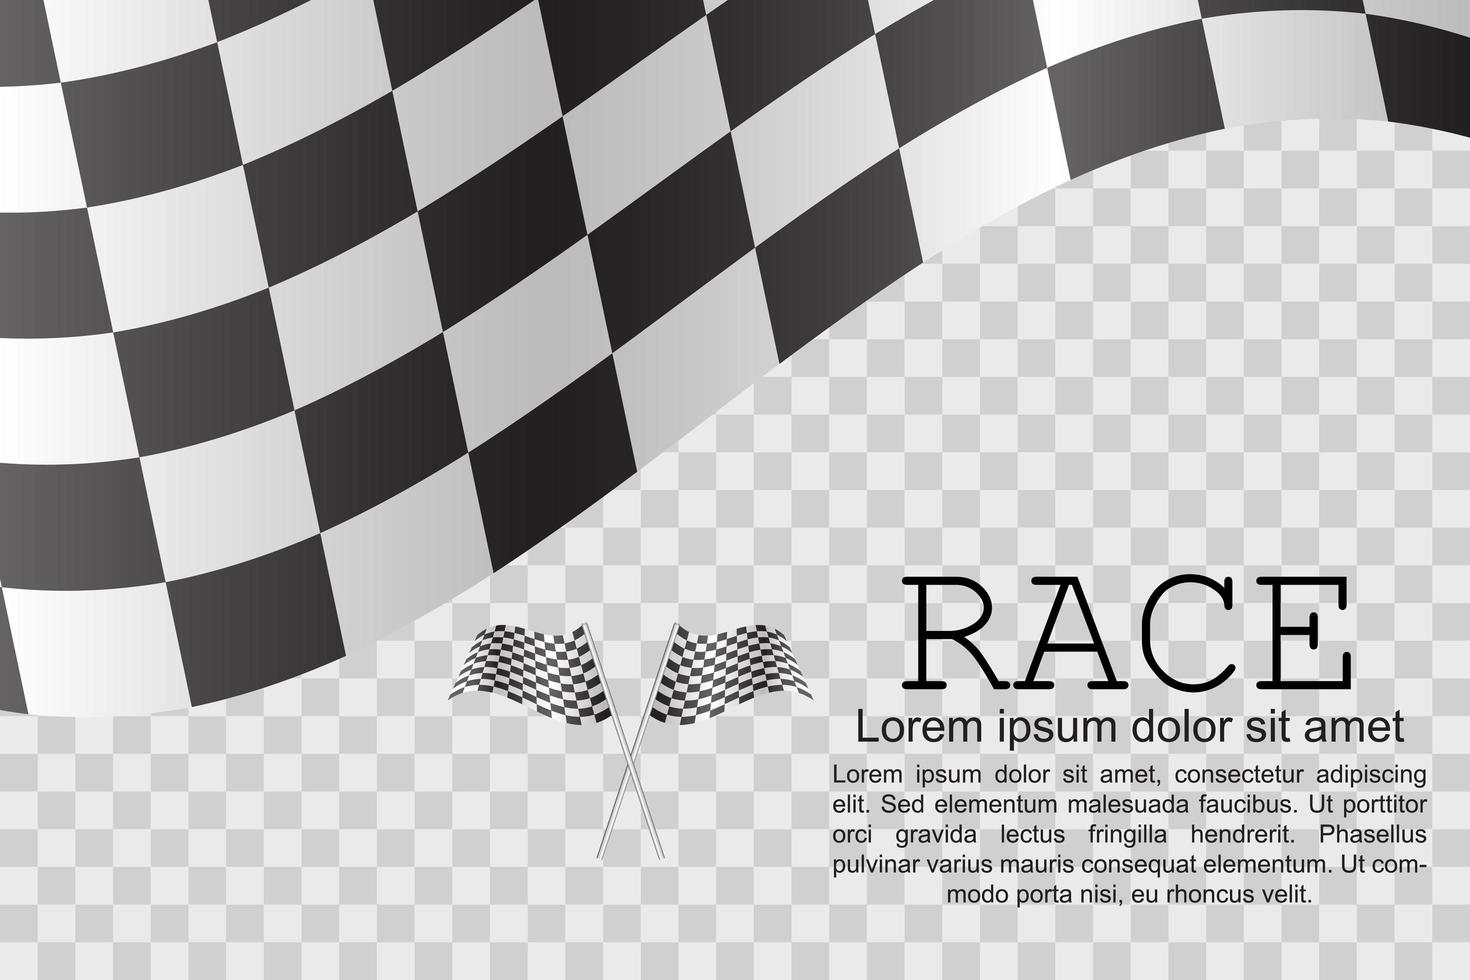 bandeiras de corrida e design padrão xadrez vetor